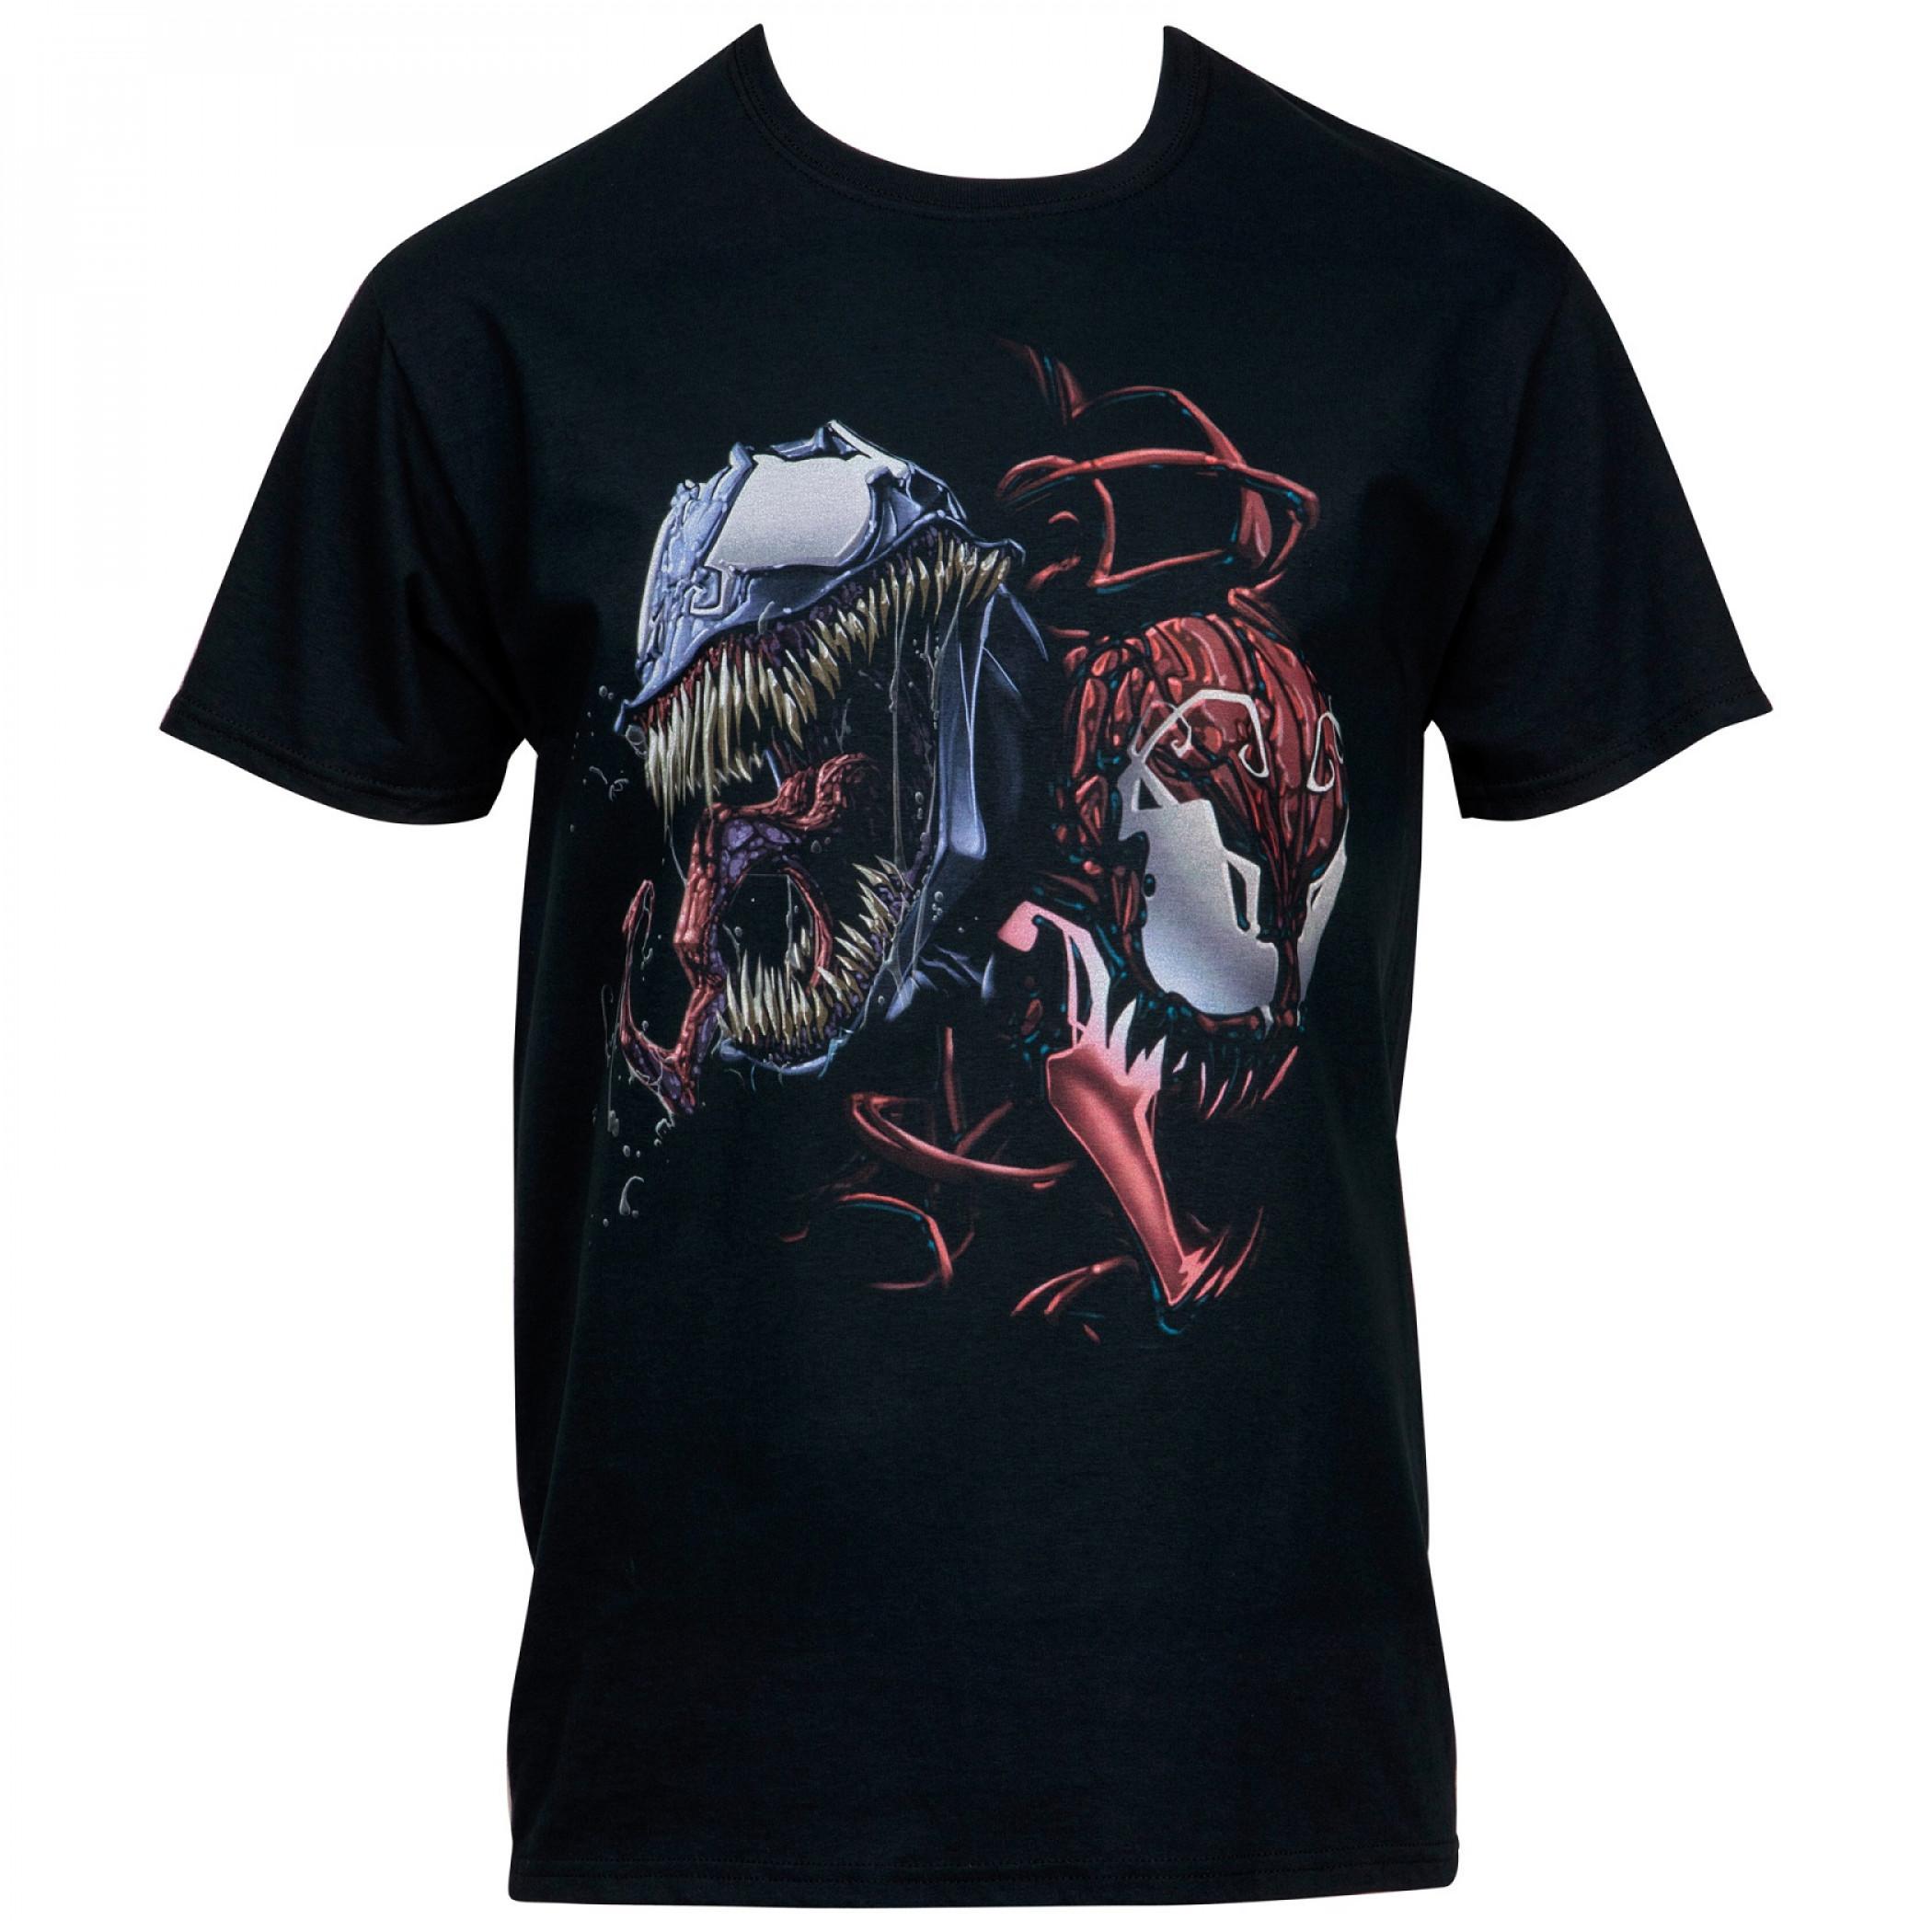 Venom and Carnage Together Forever T-Shirt